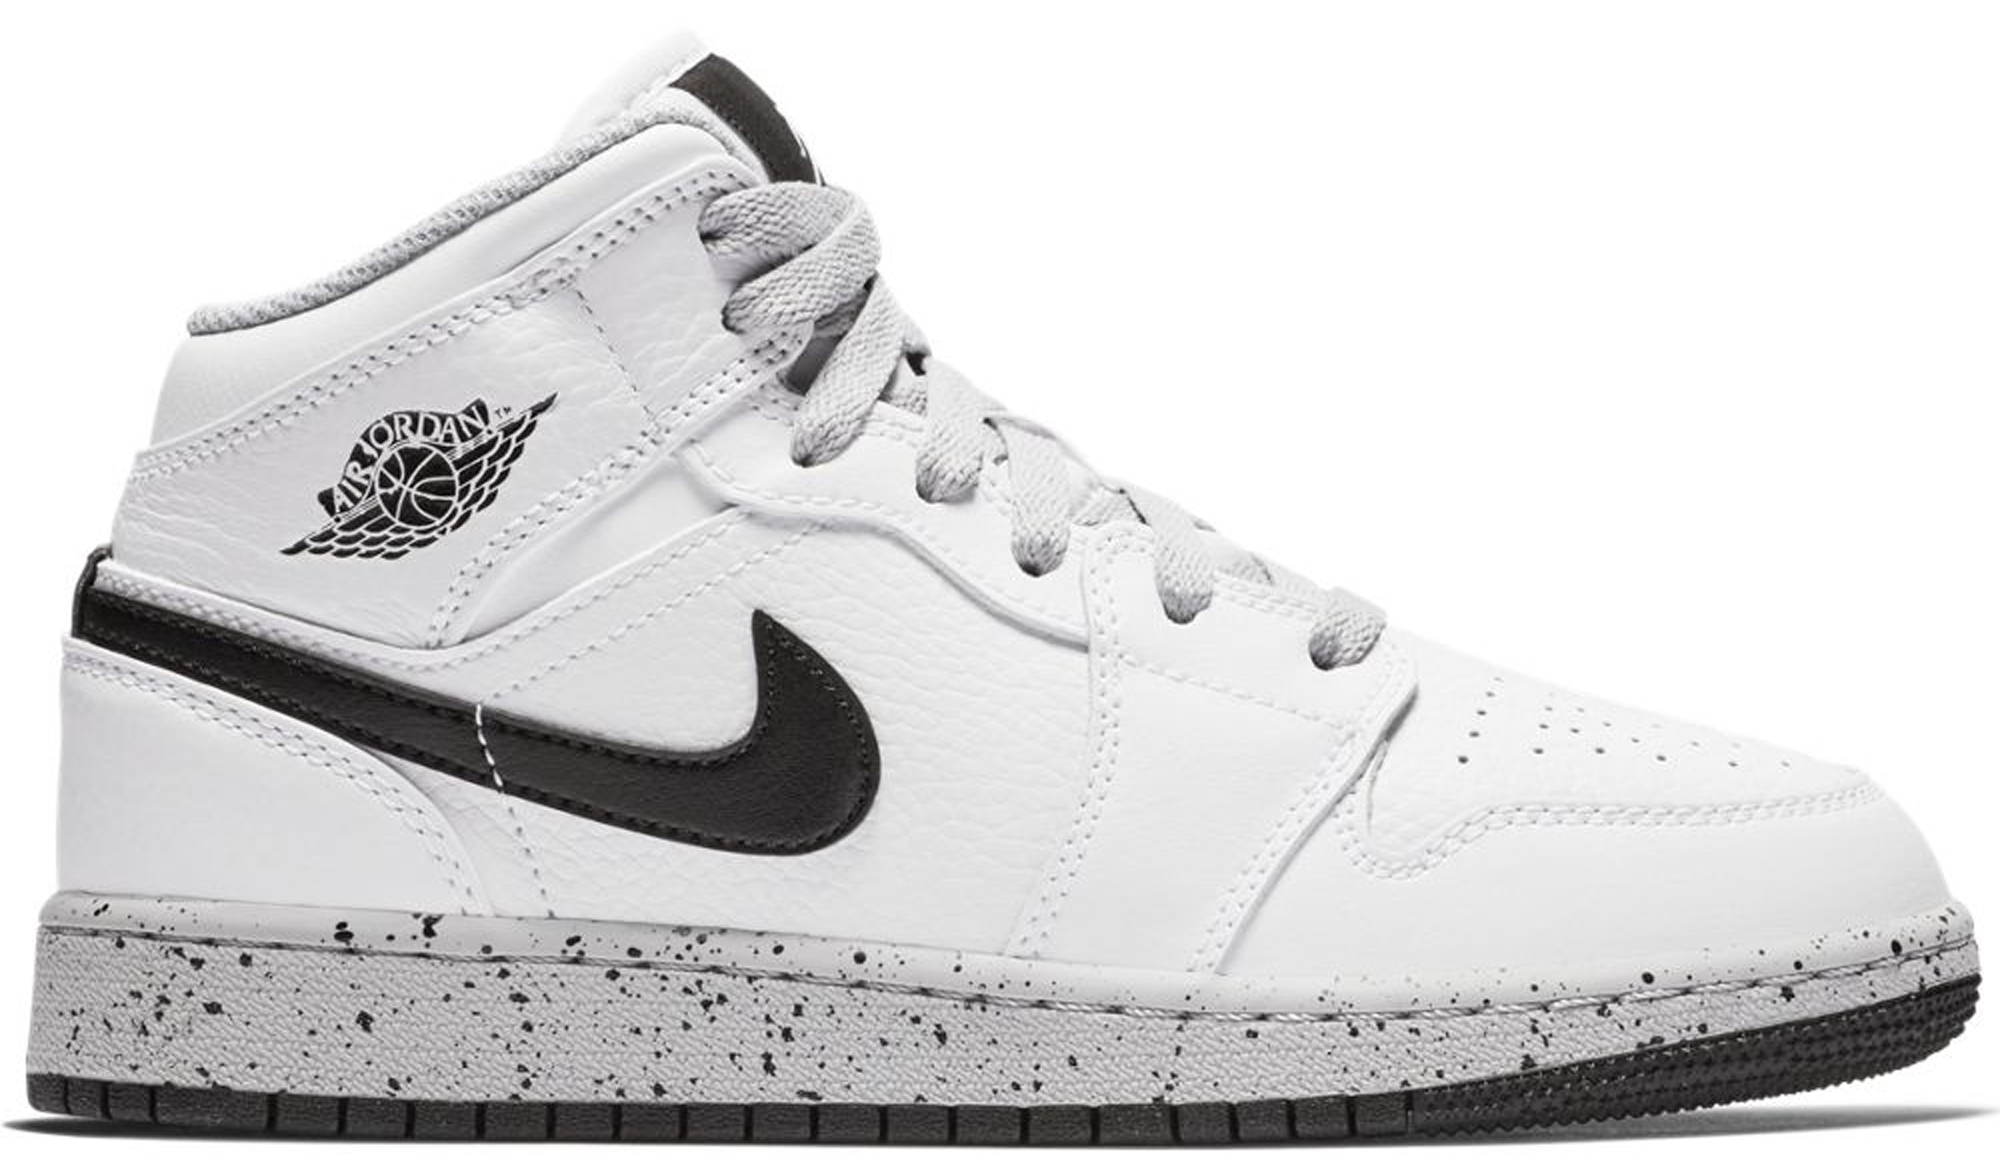 Jordan 1 Mid White Cement (GS) - 554725-115